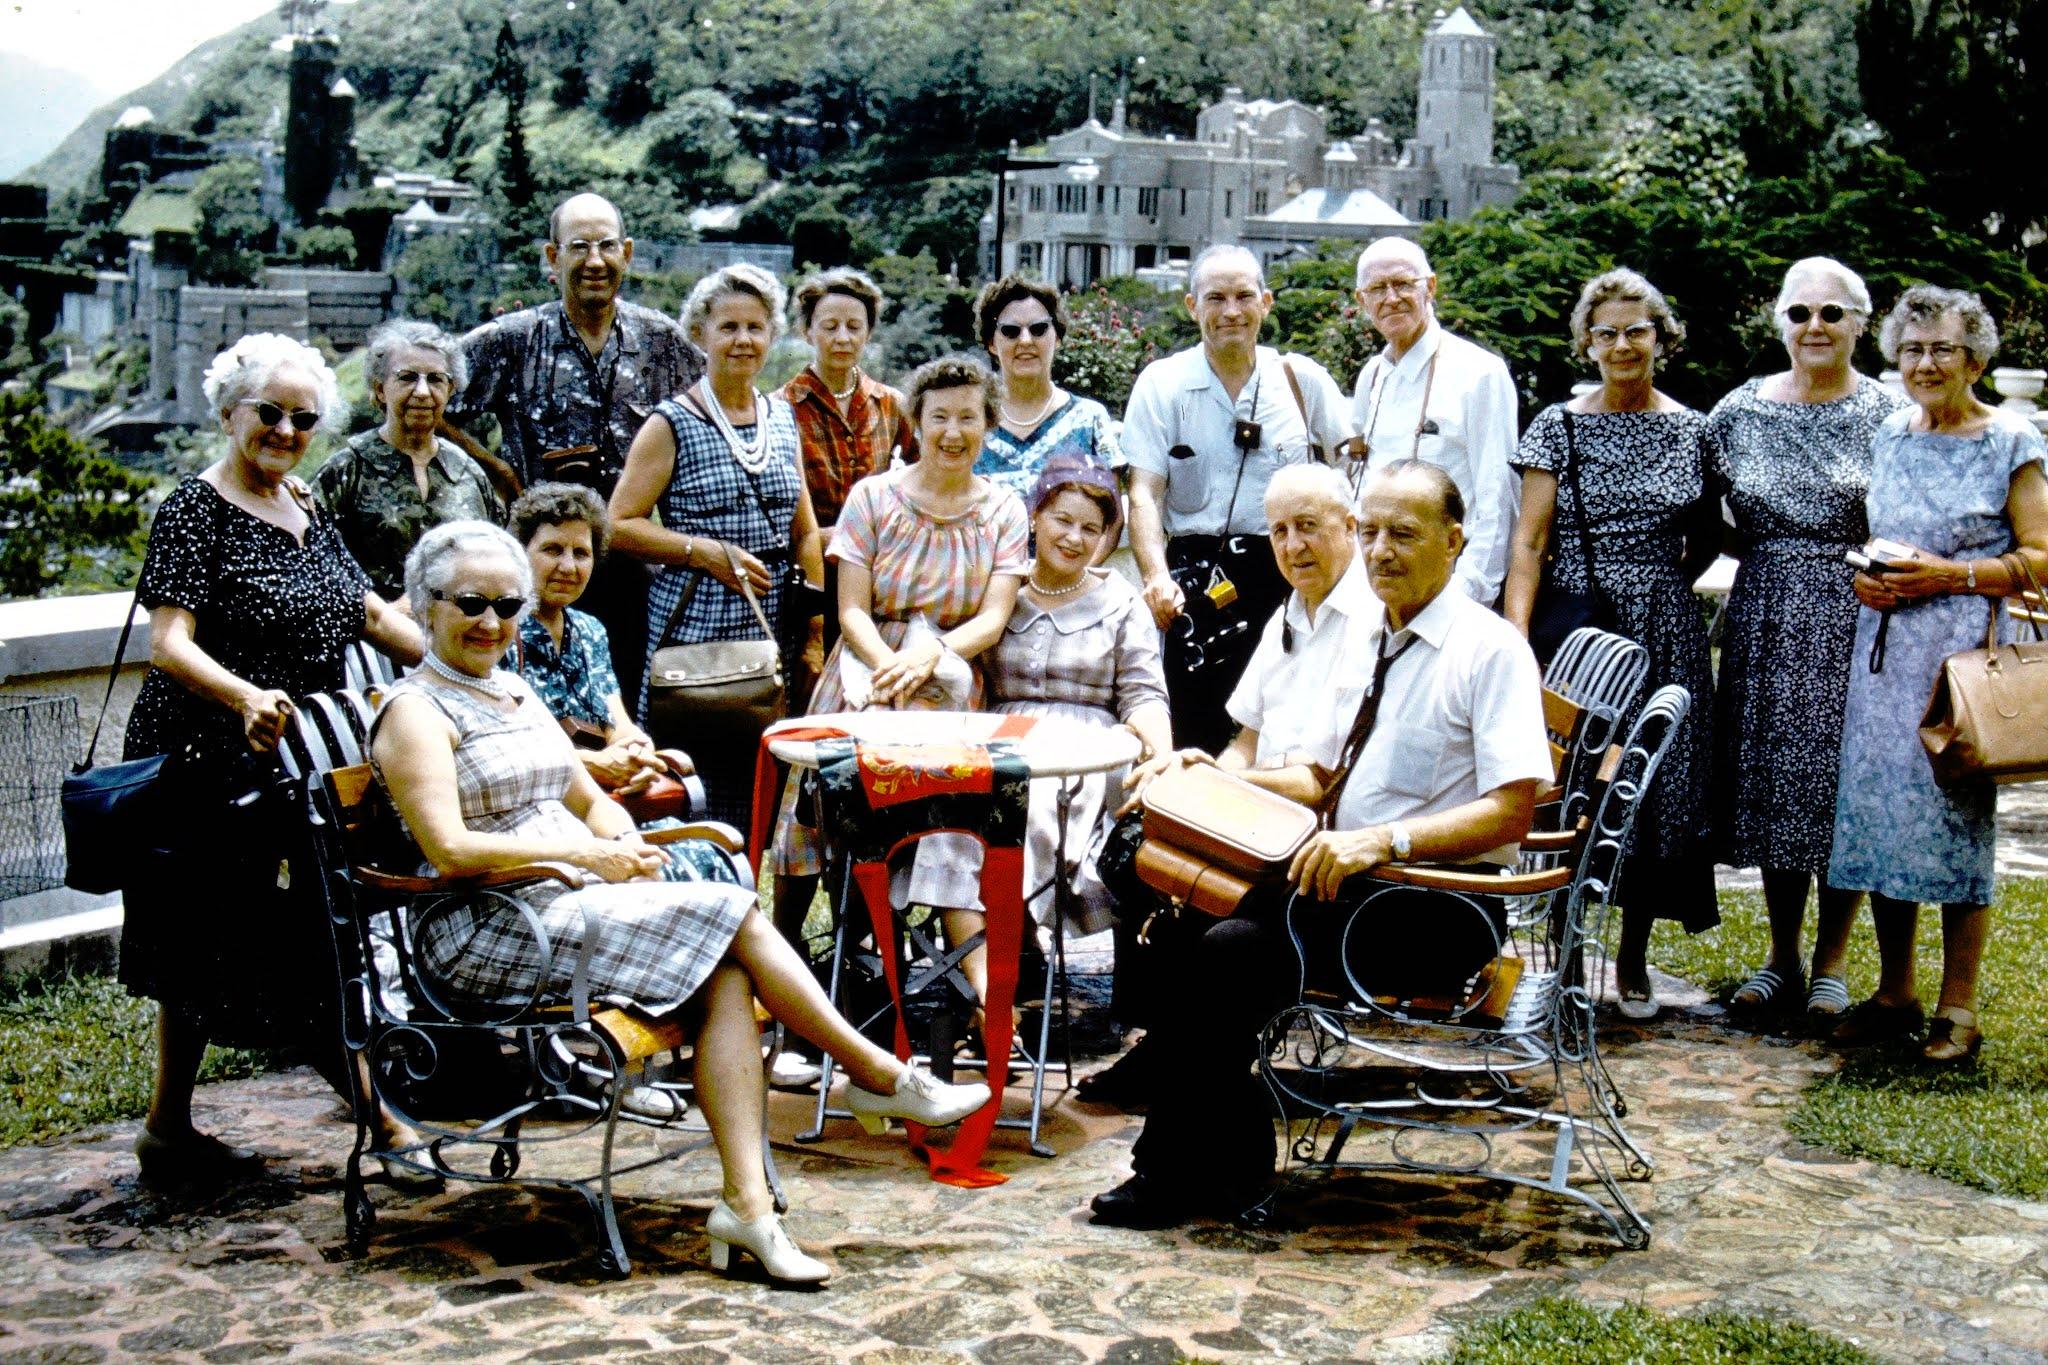 Around the World Tour Group - Hong Kong - 1961